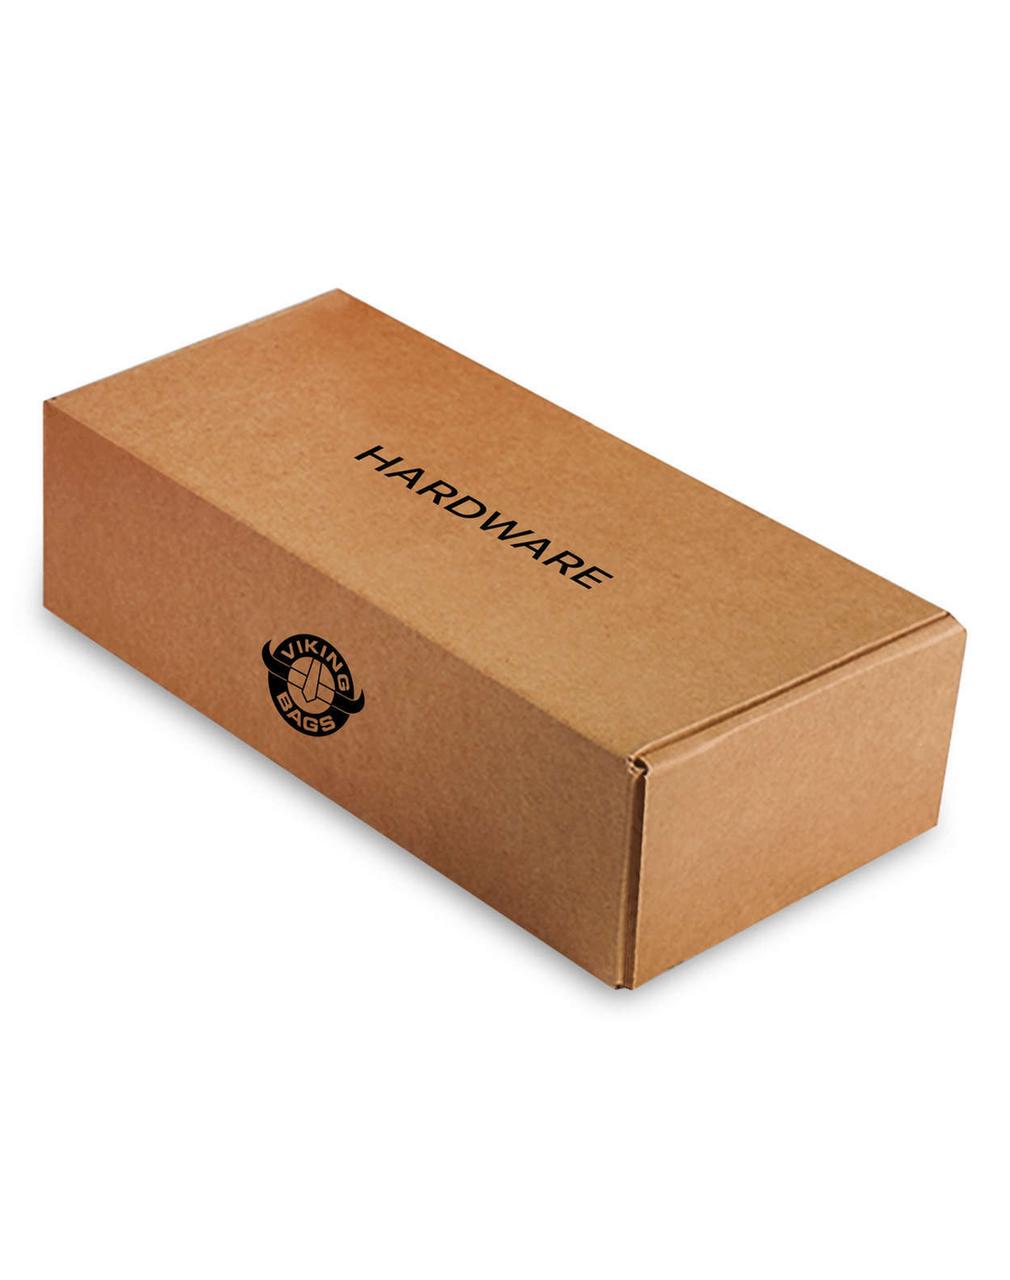 Triumph Thunderbird Charger Single Strap Medium Motorcycle Saddlebags Box